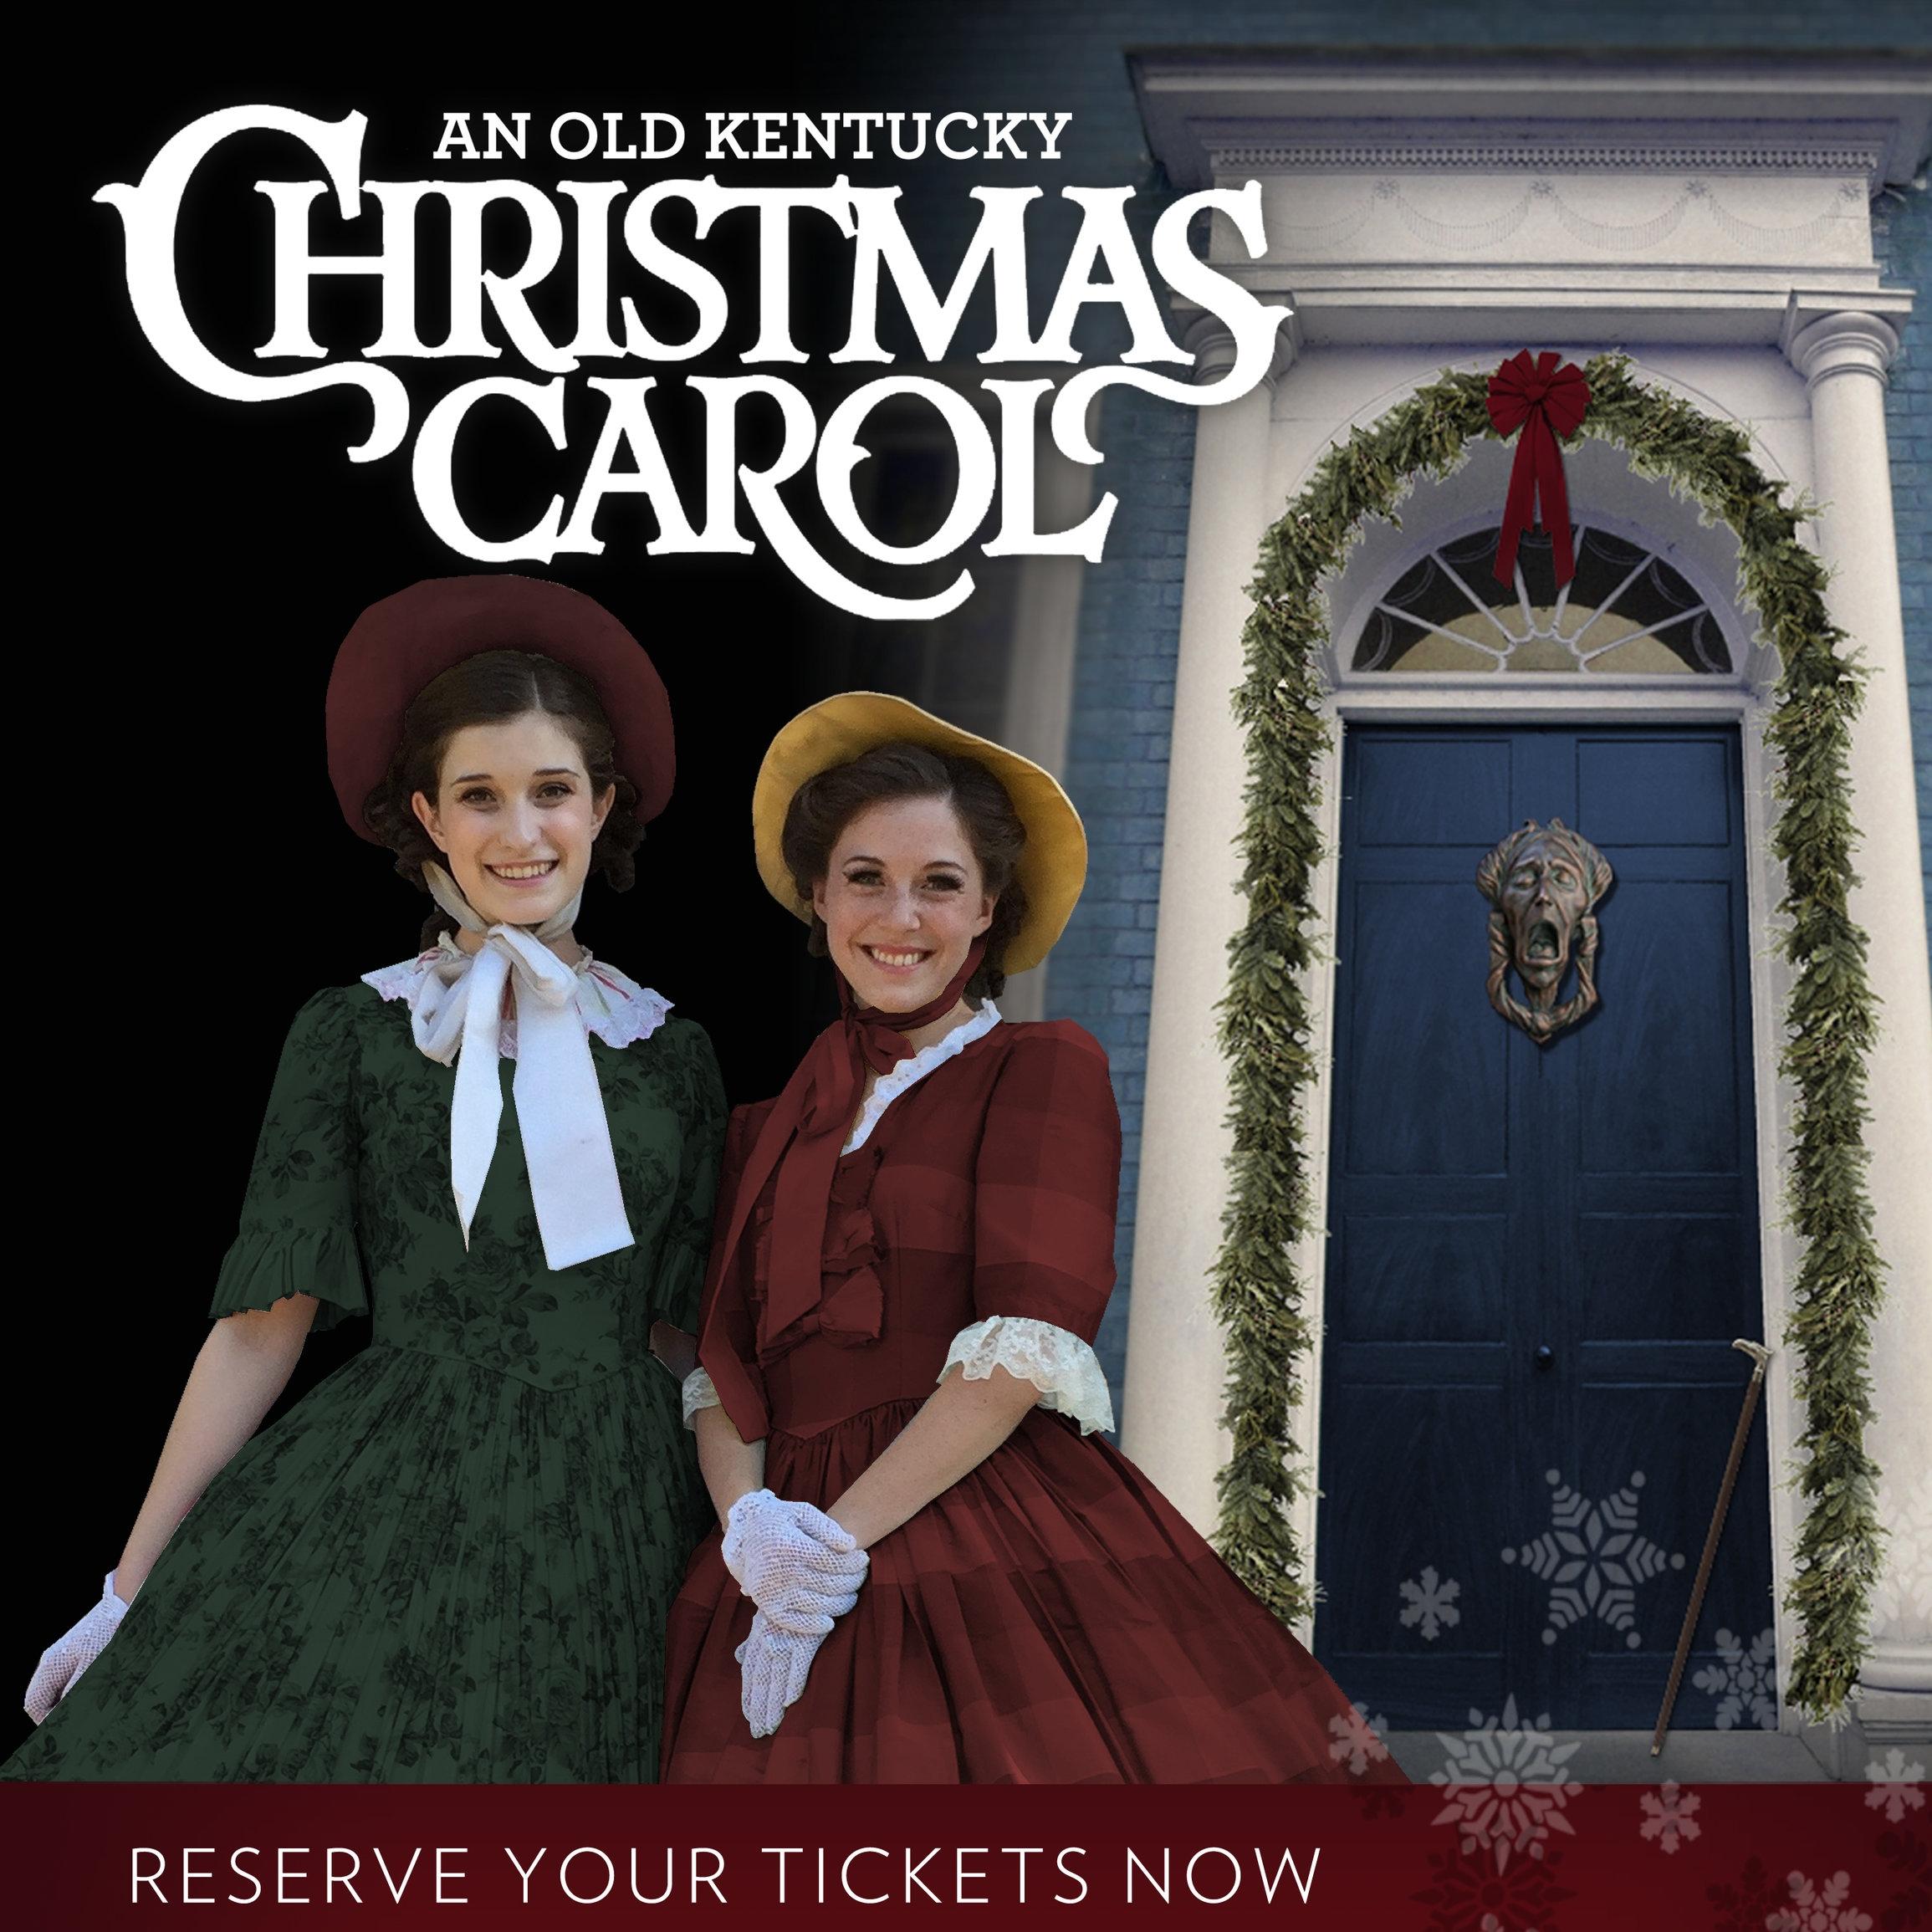 An Old Kentucky Christmas Carol — My Old Kentucky Home